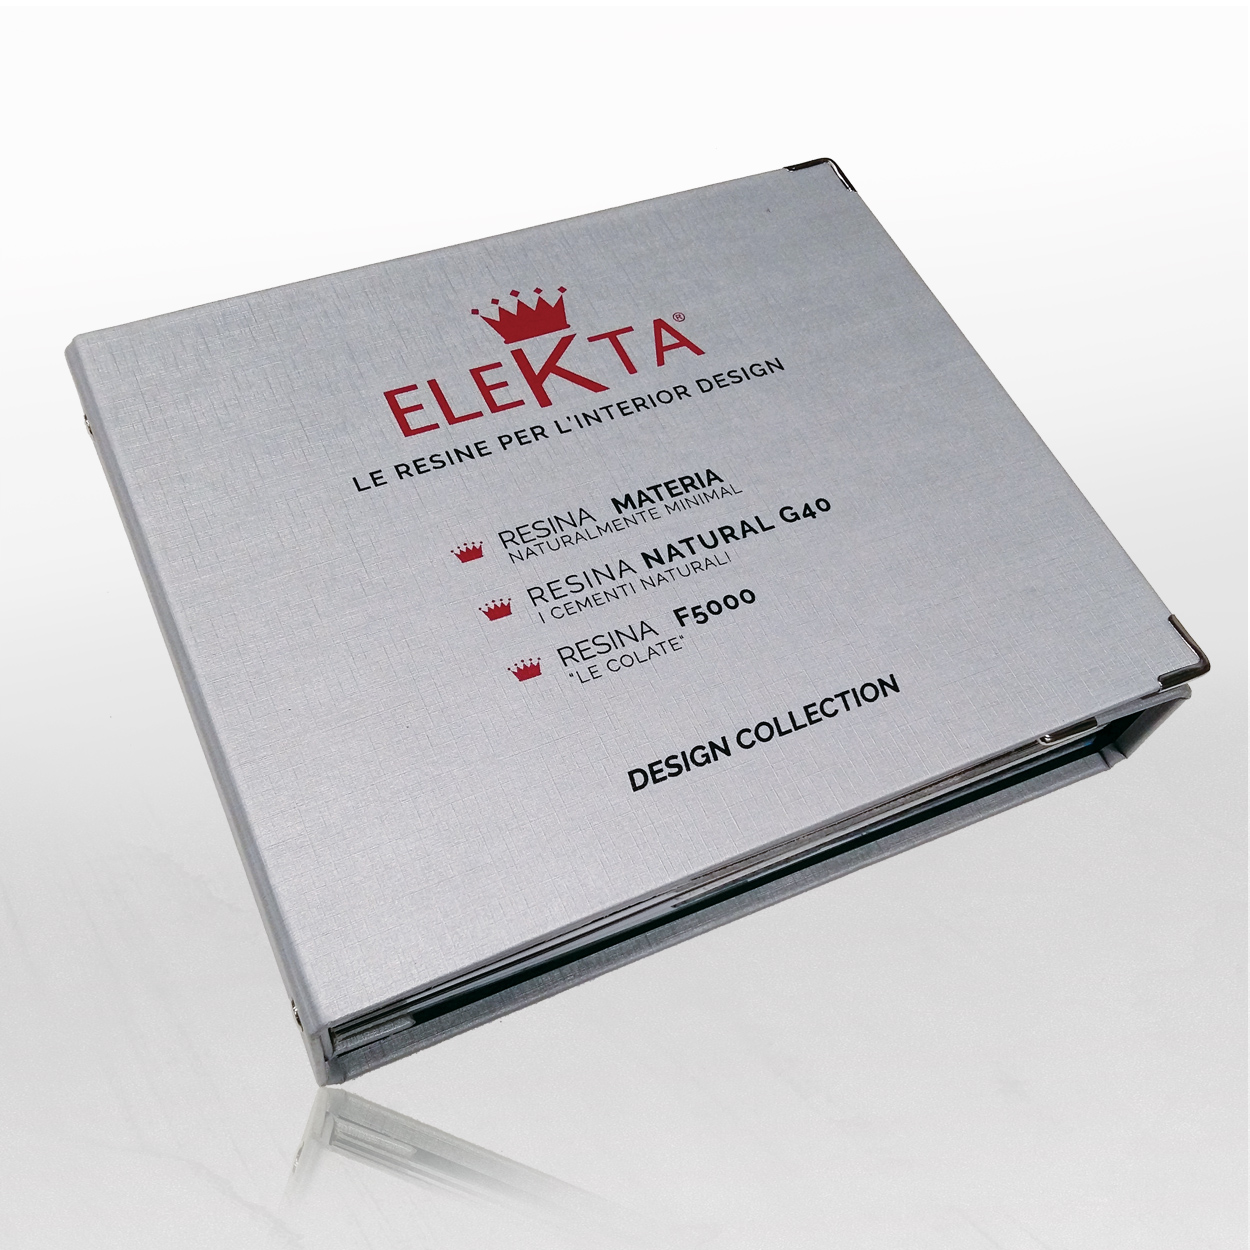 Book mini book elekta linea resine elekta linea resine for Resina elekta